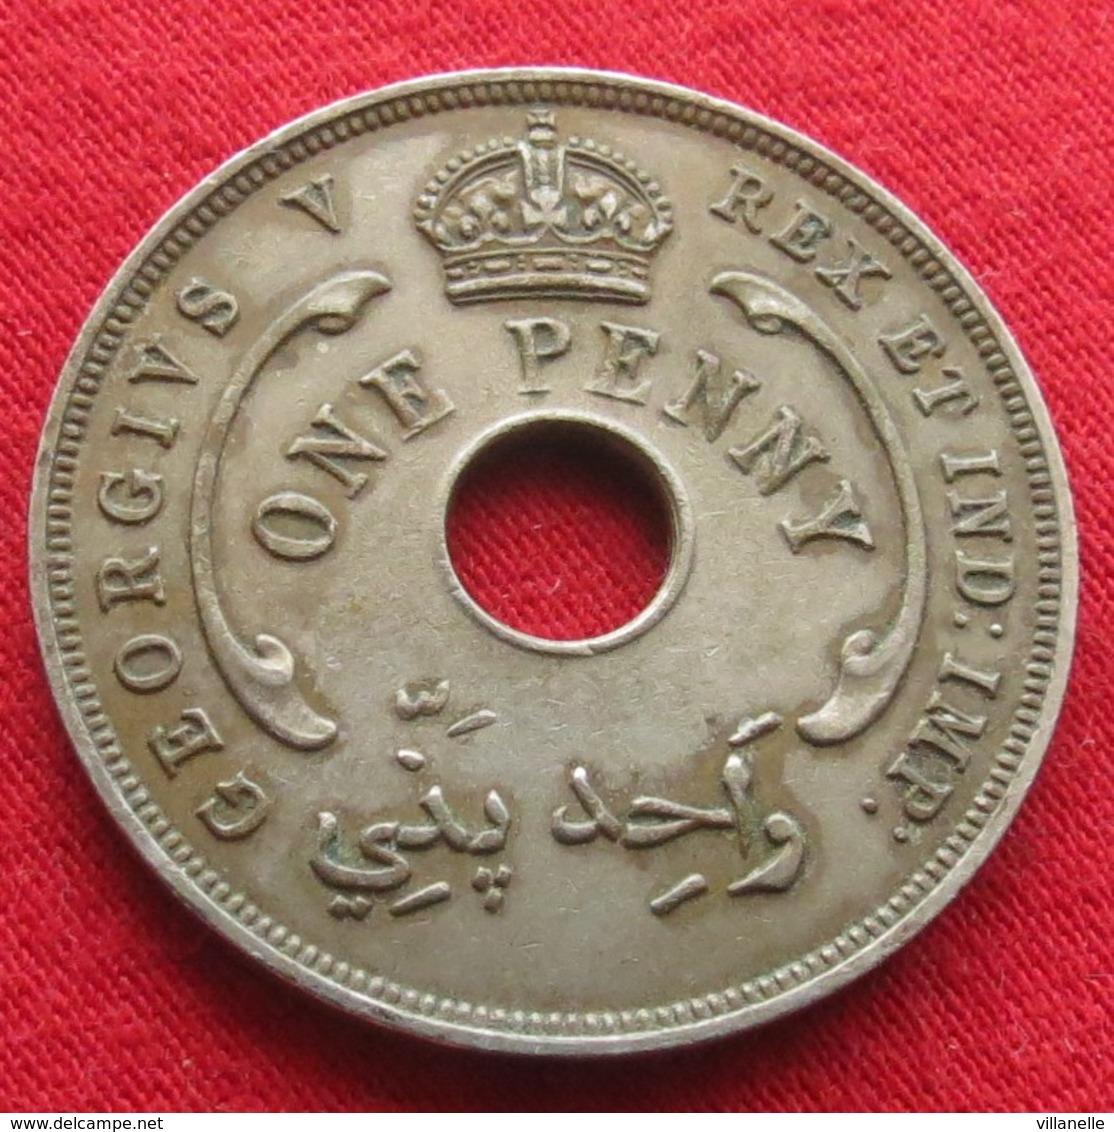 British West Africa 1 Penny 1935 #0  Brits Afrika Afrique Britannique Britanica  #0 W - Monnaies